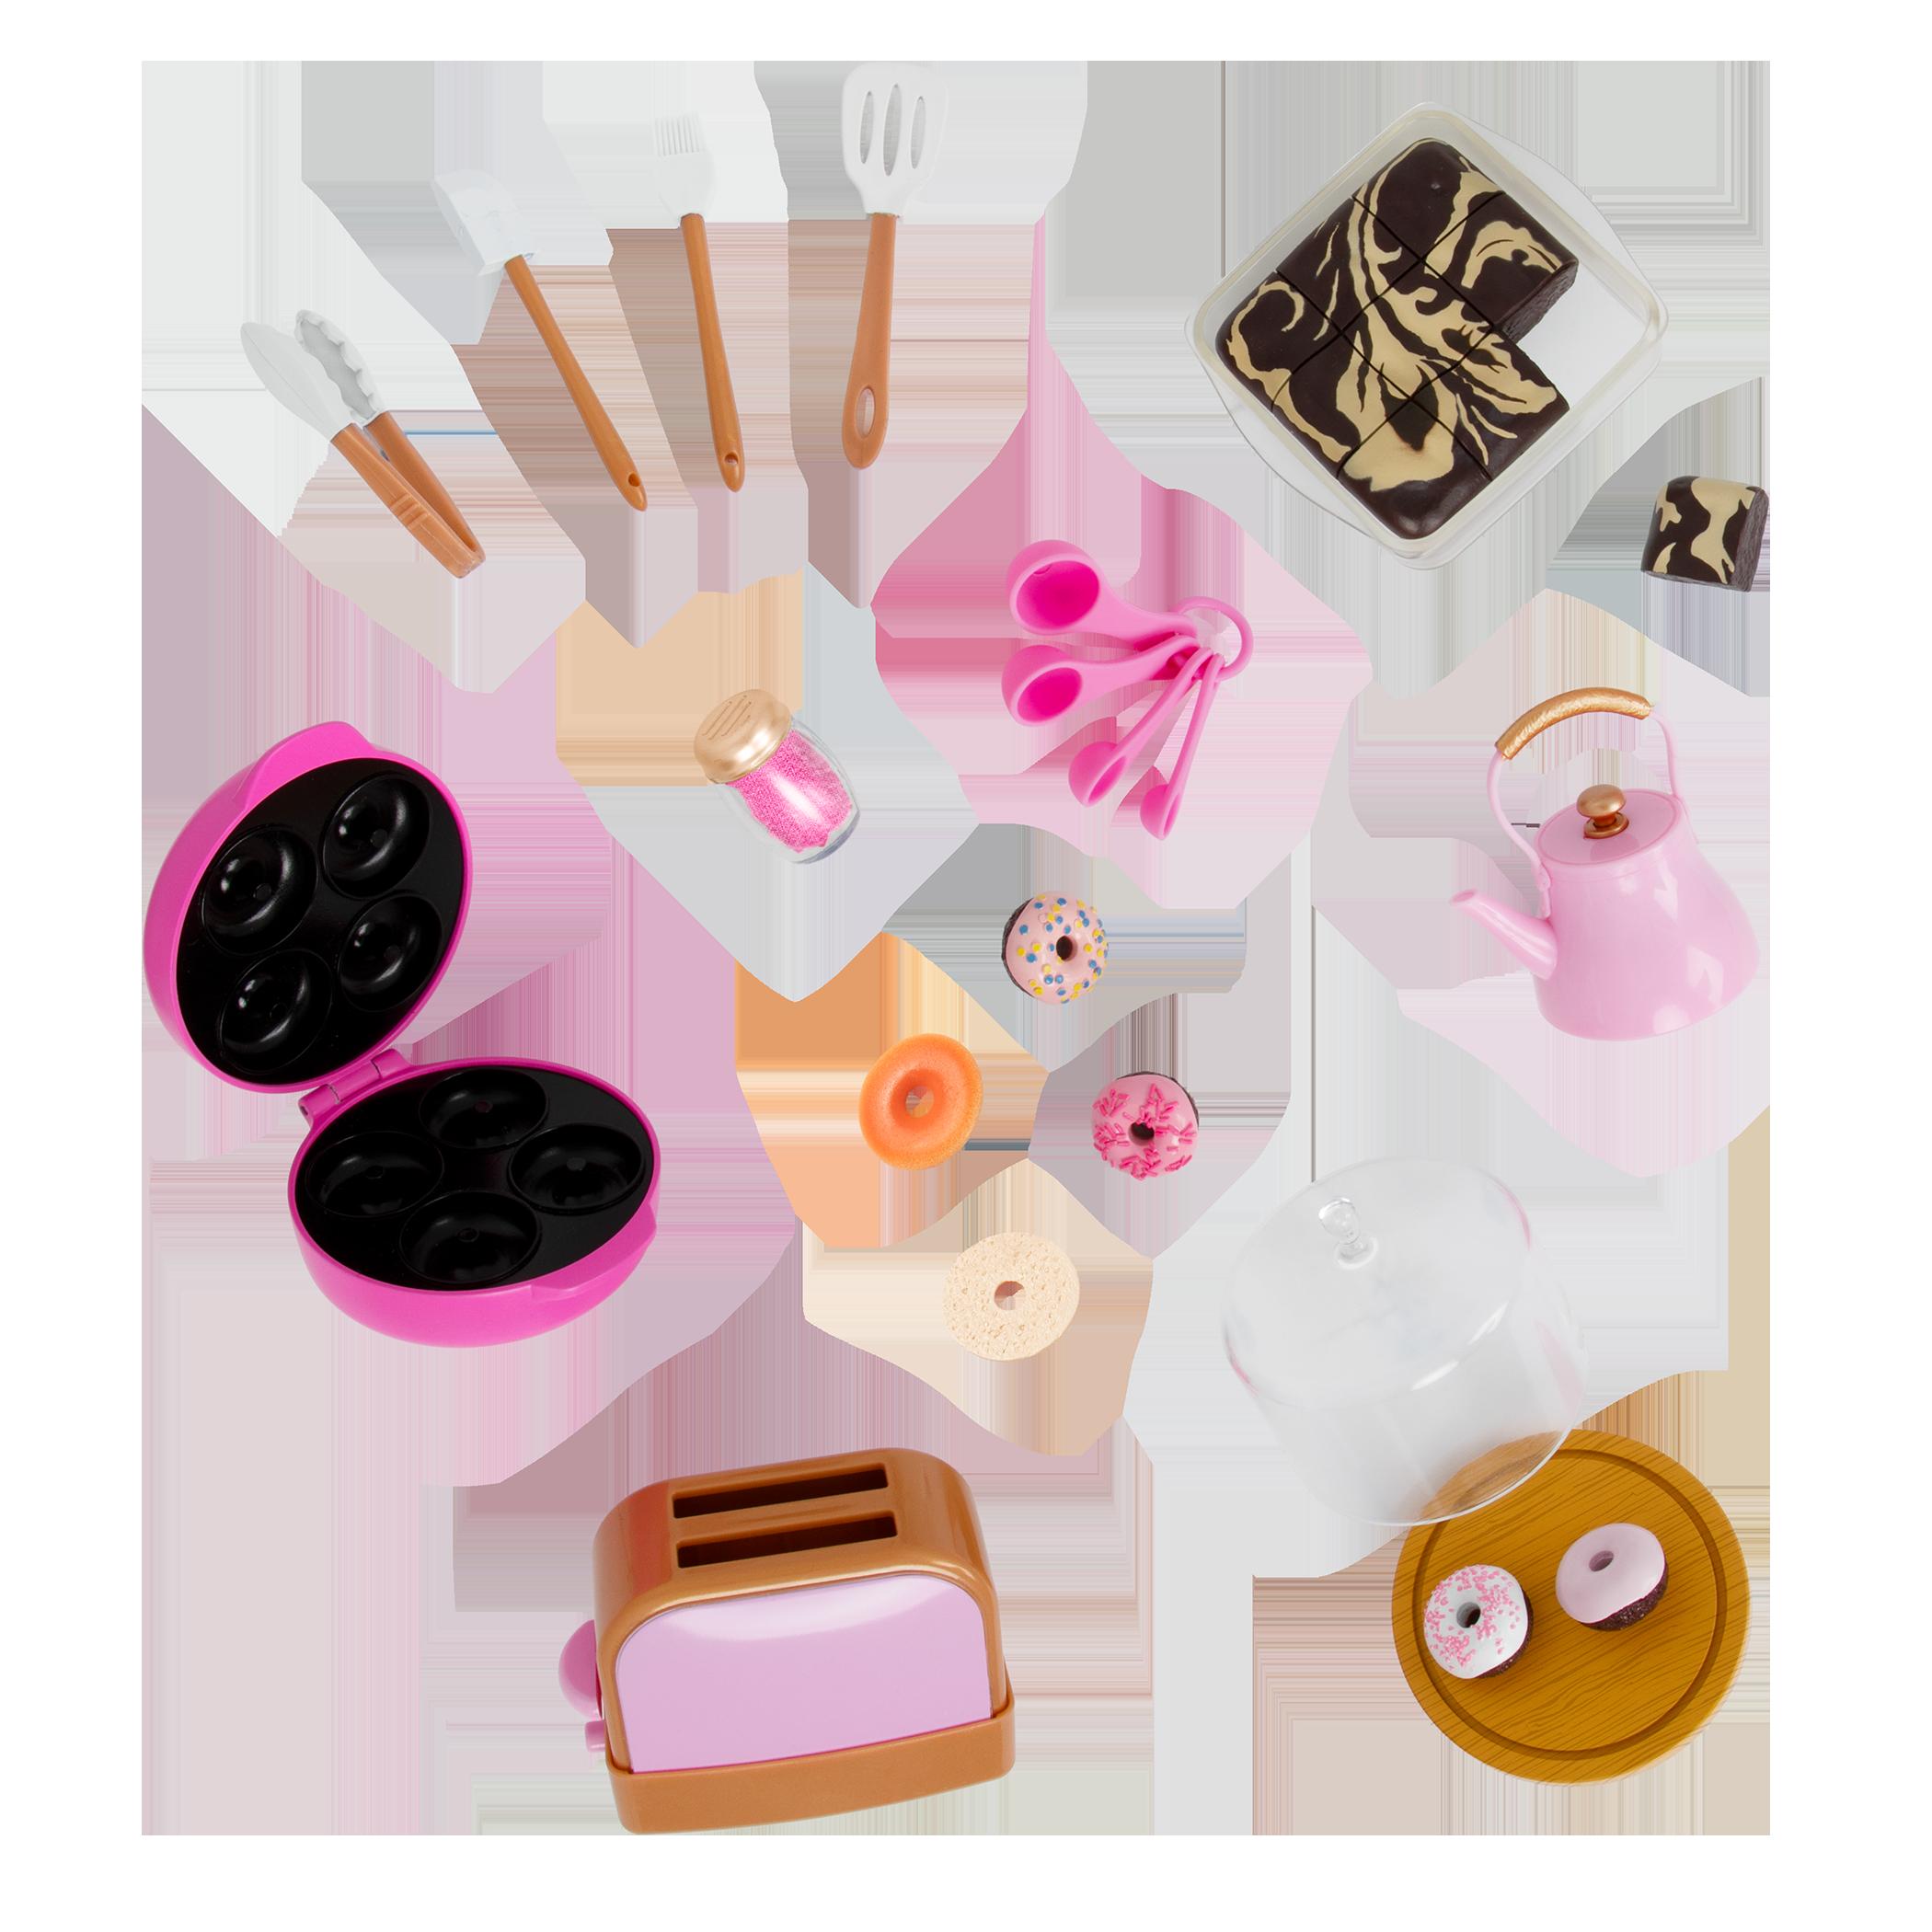 Our Generation Baker's Kitchen Set for 18-inch Dolls